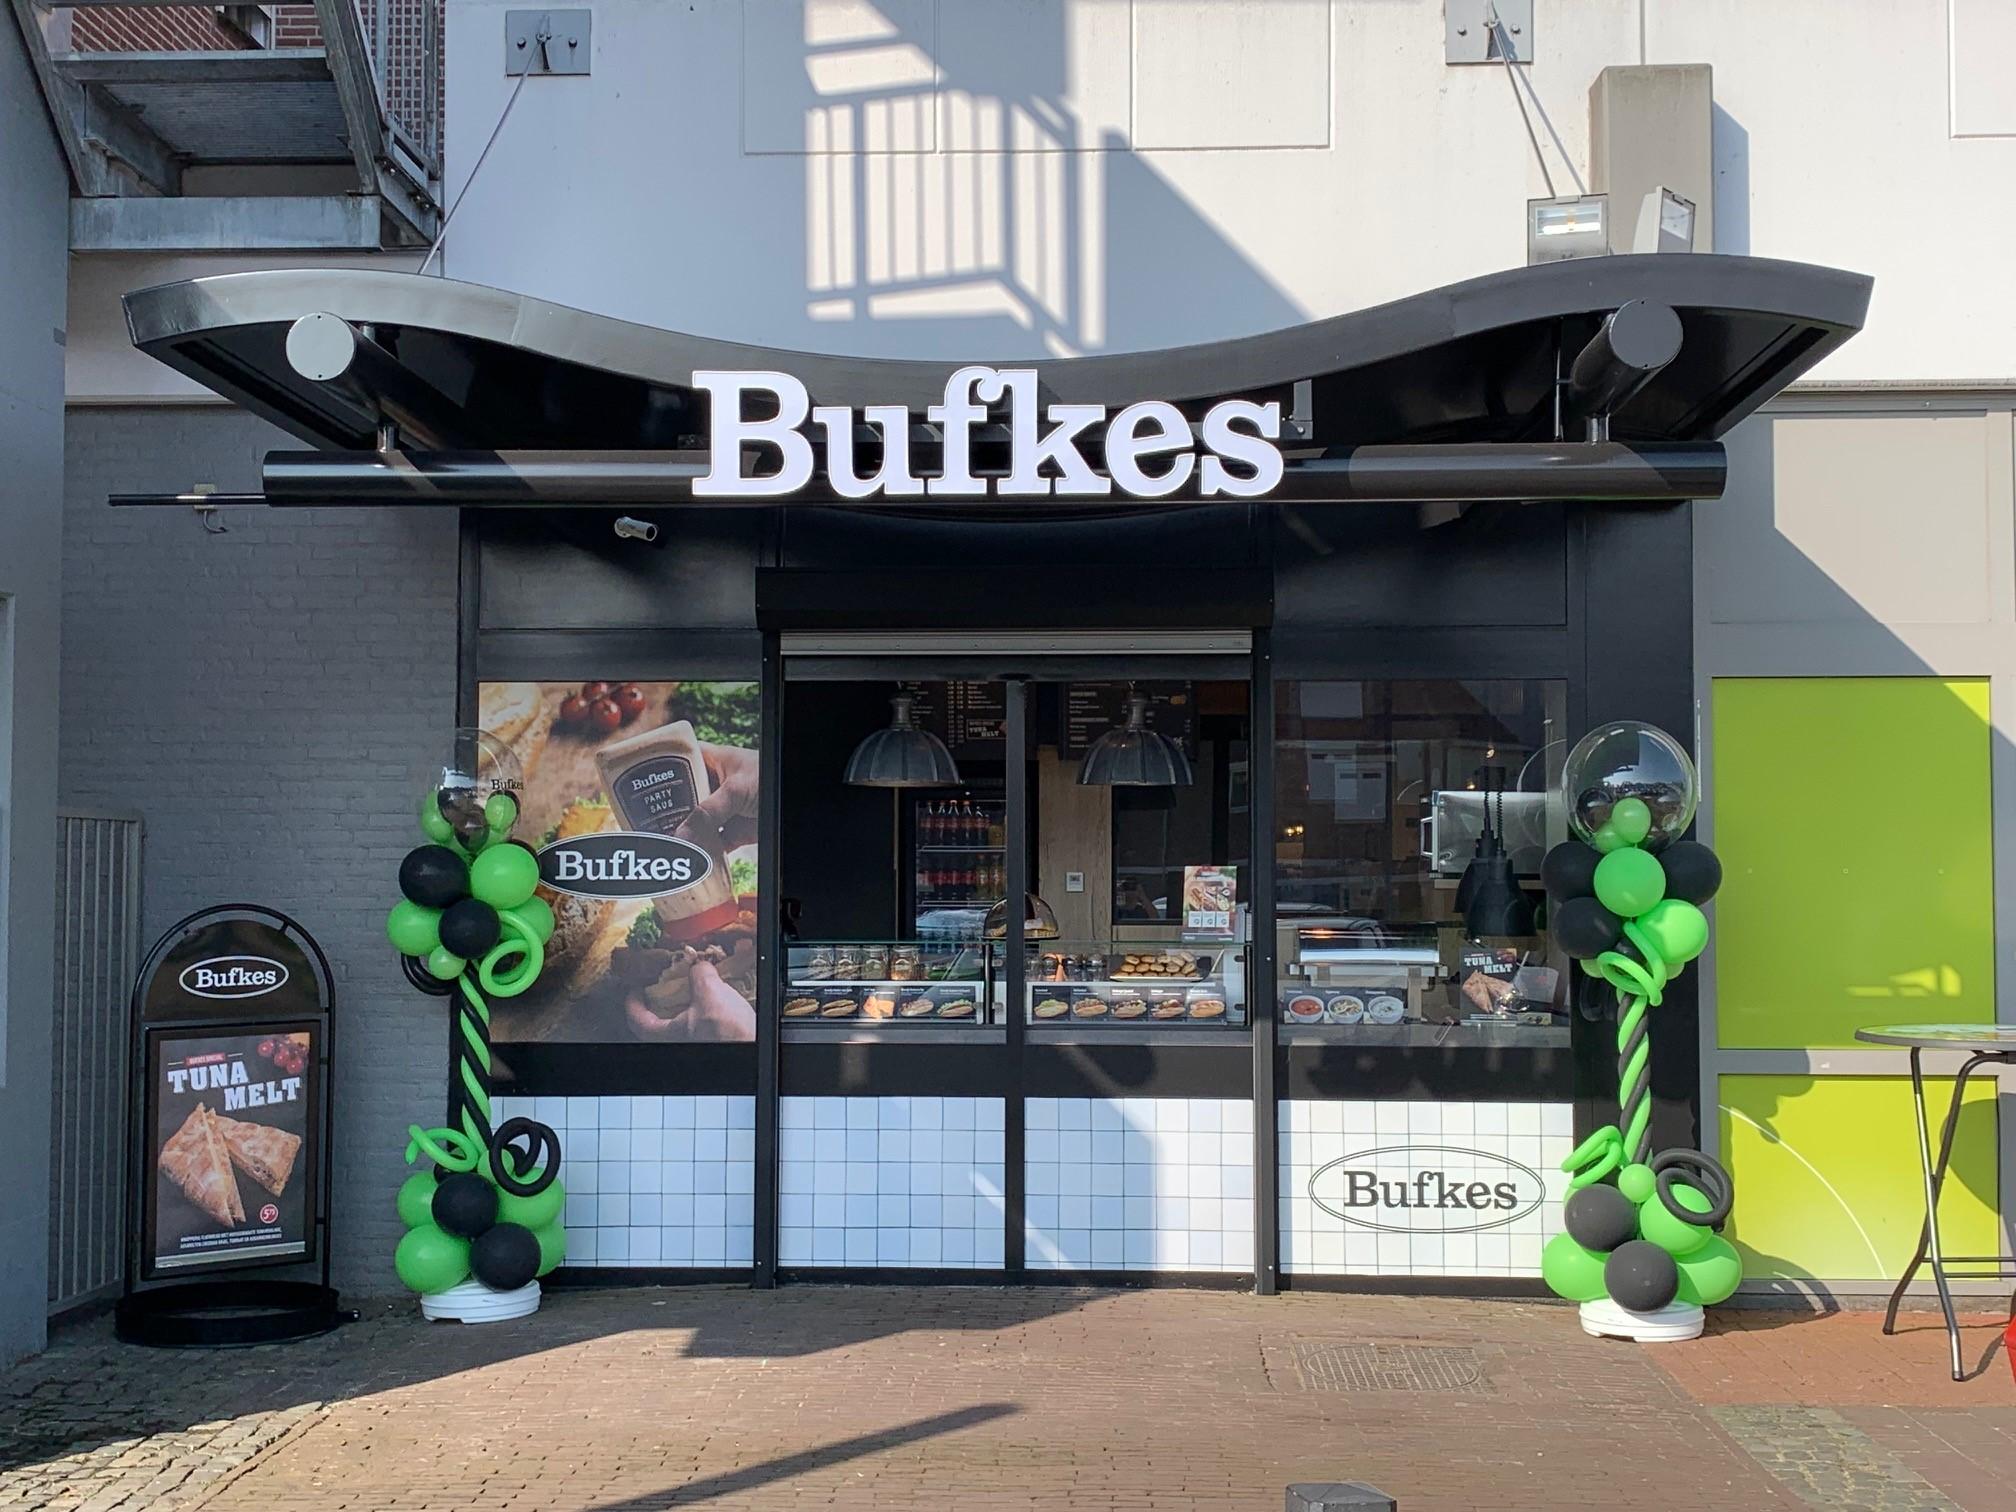 Franchiseformule Bufkes opent in franchiseformule PLUS